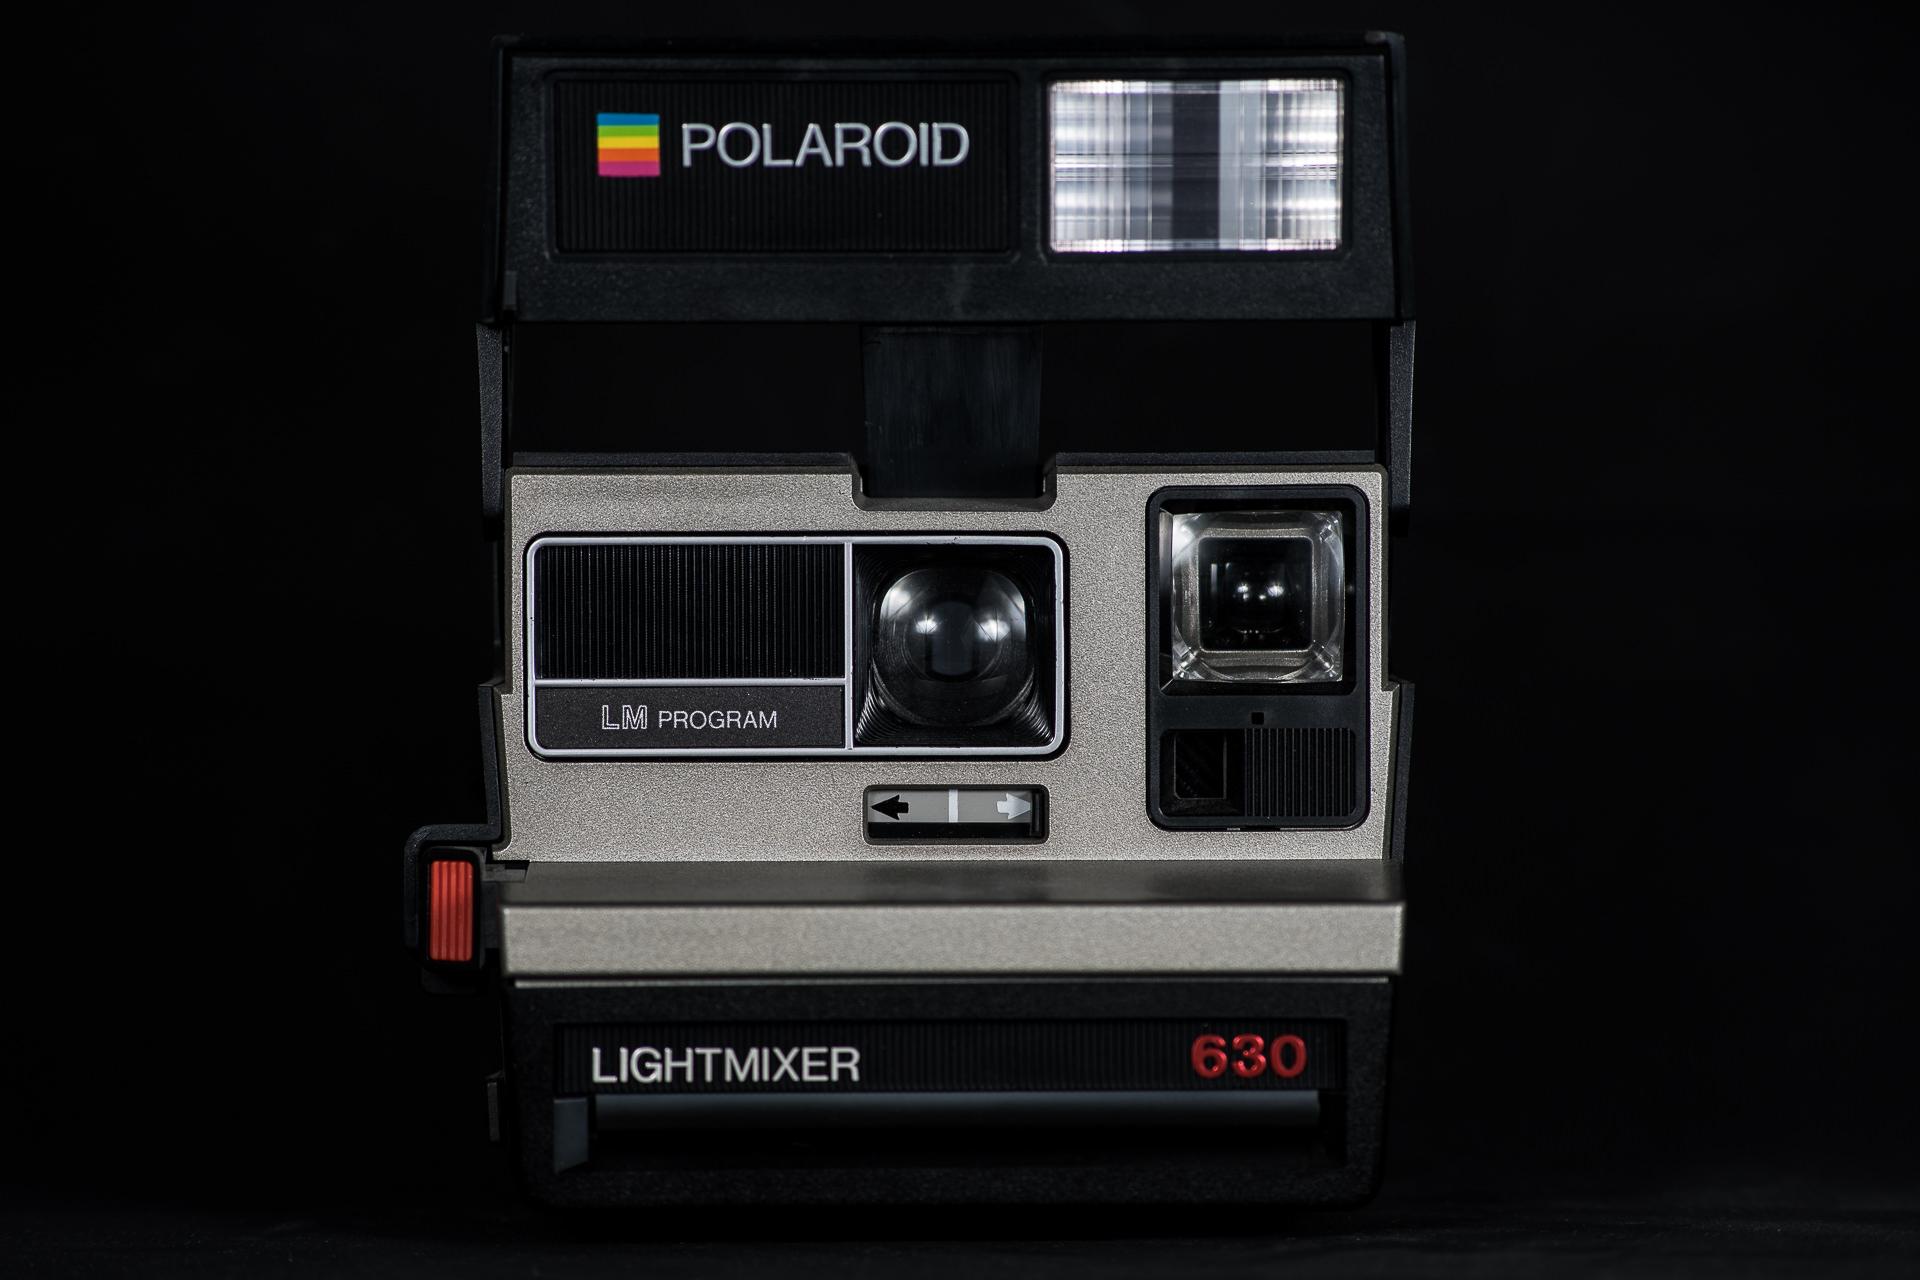 polaroid lightmixer 630 sofortbildkamera. Black Bedroom Furniture Sets. Home Design Ideas